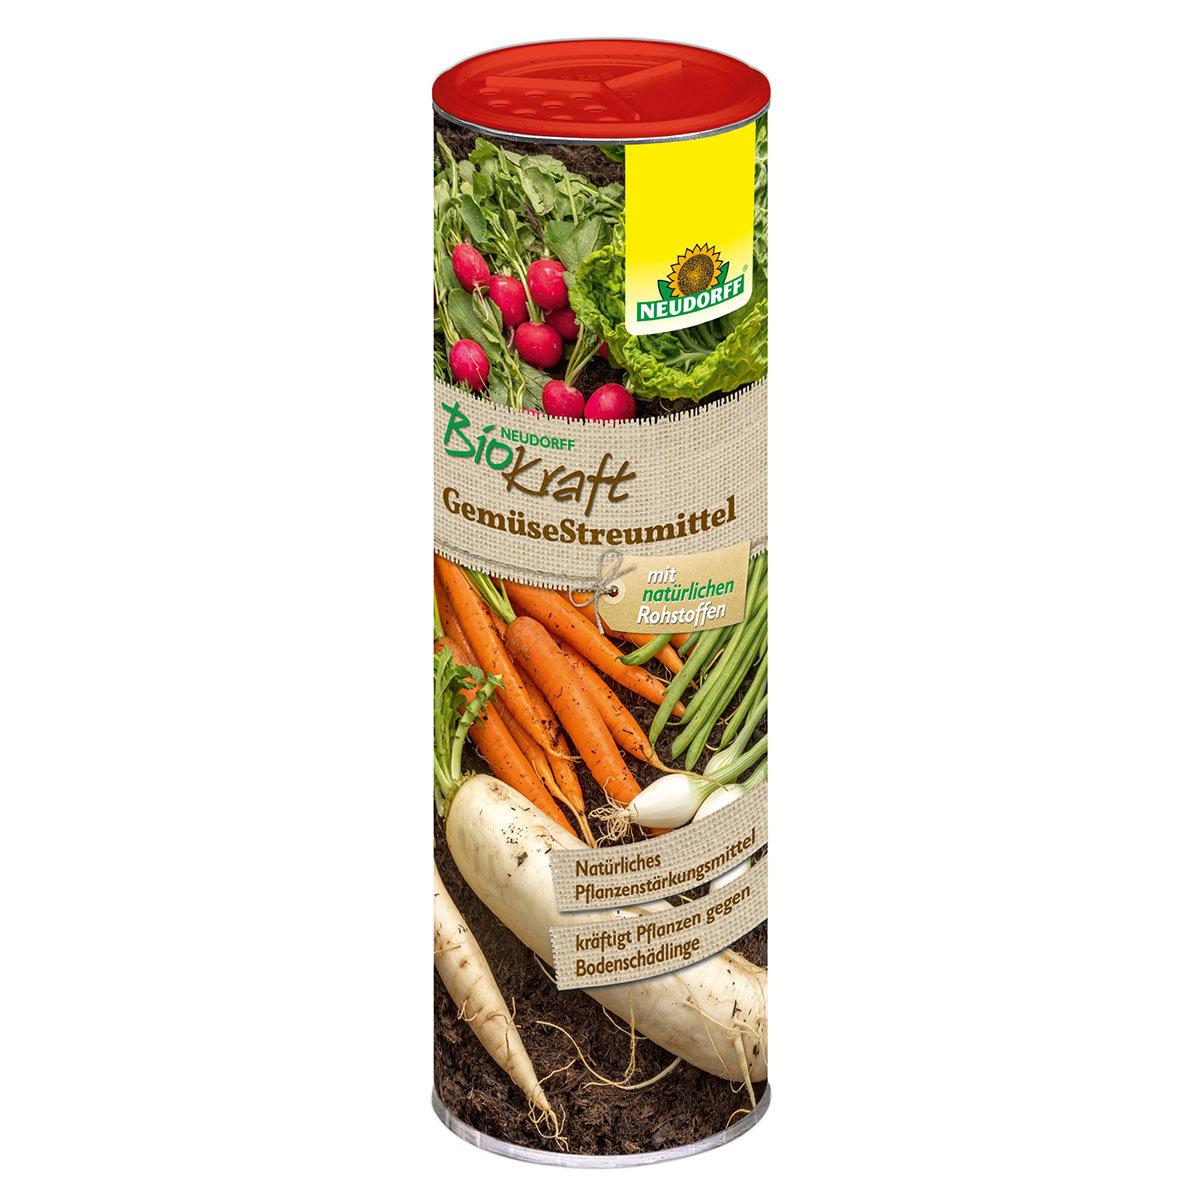 BioKraft GemüseStreumittel, 0,5 kg